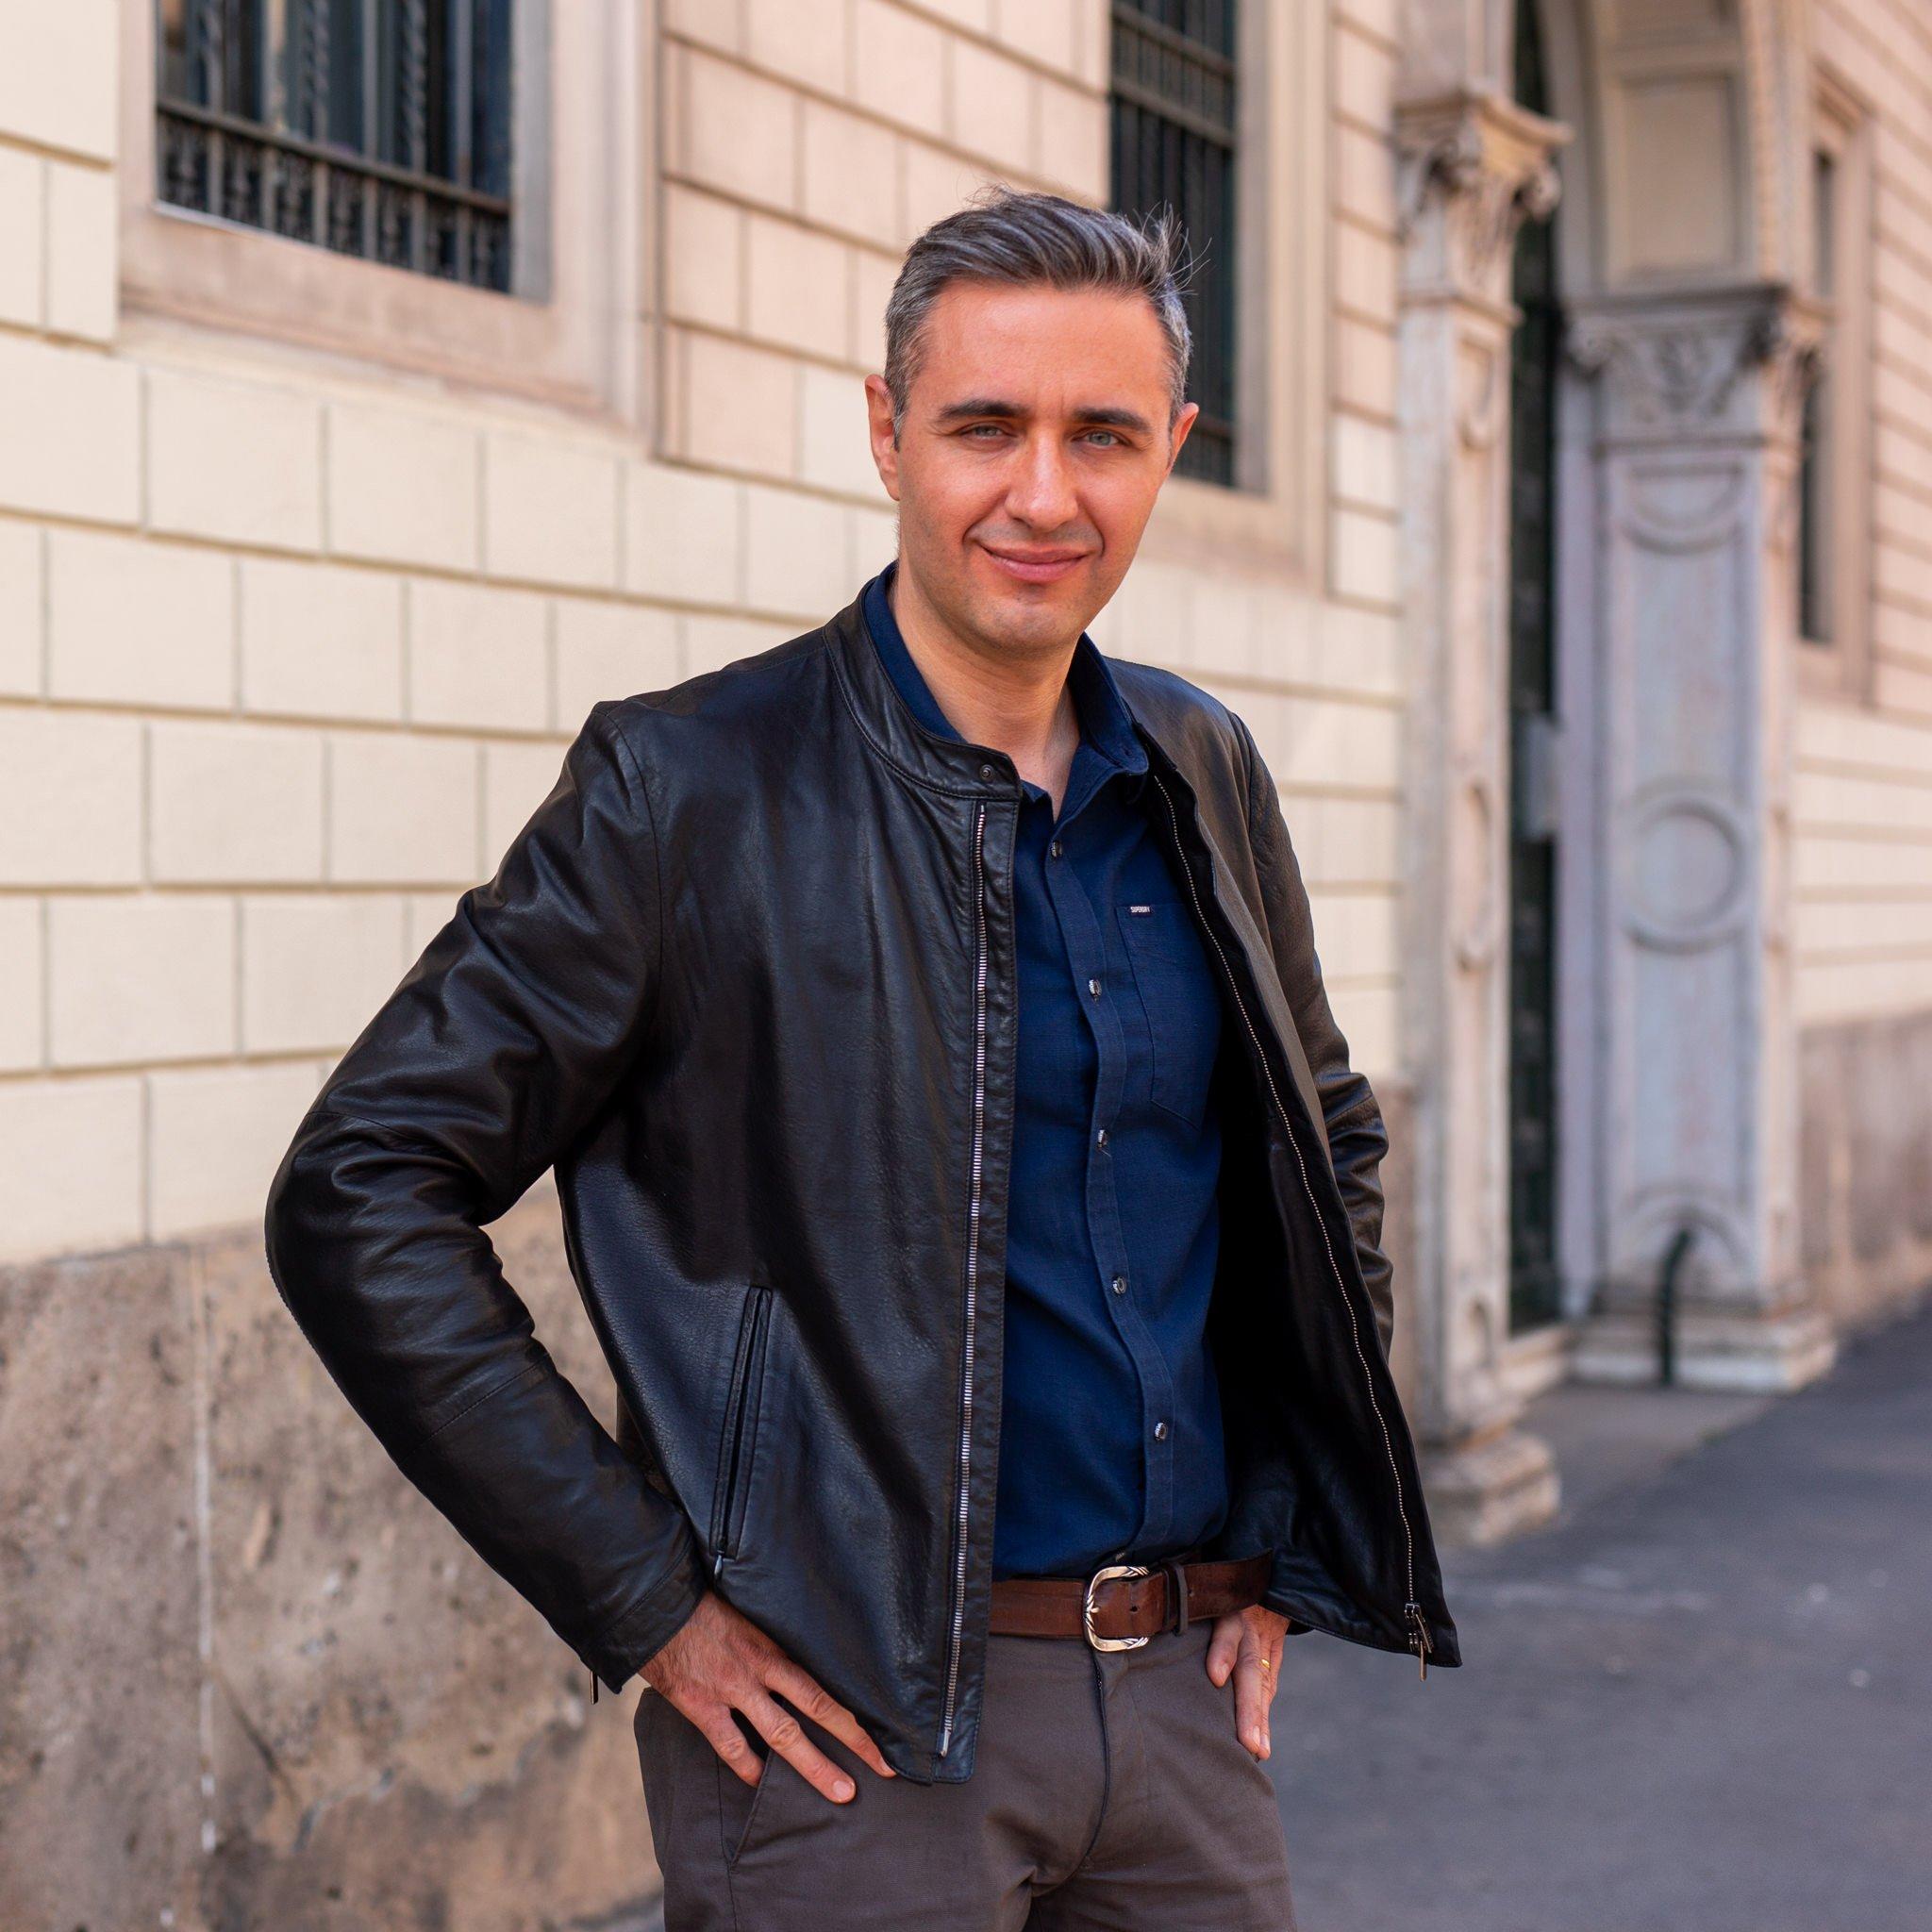 Portrait of Milan photographer Alessandro della Savia